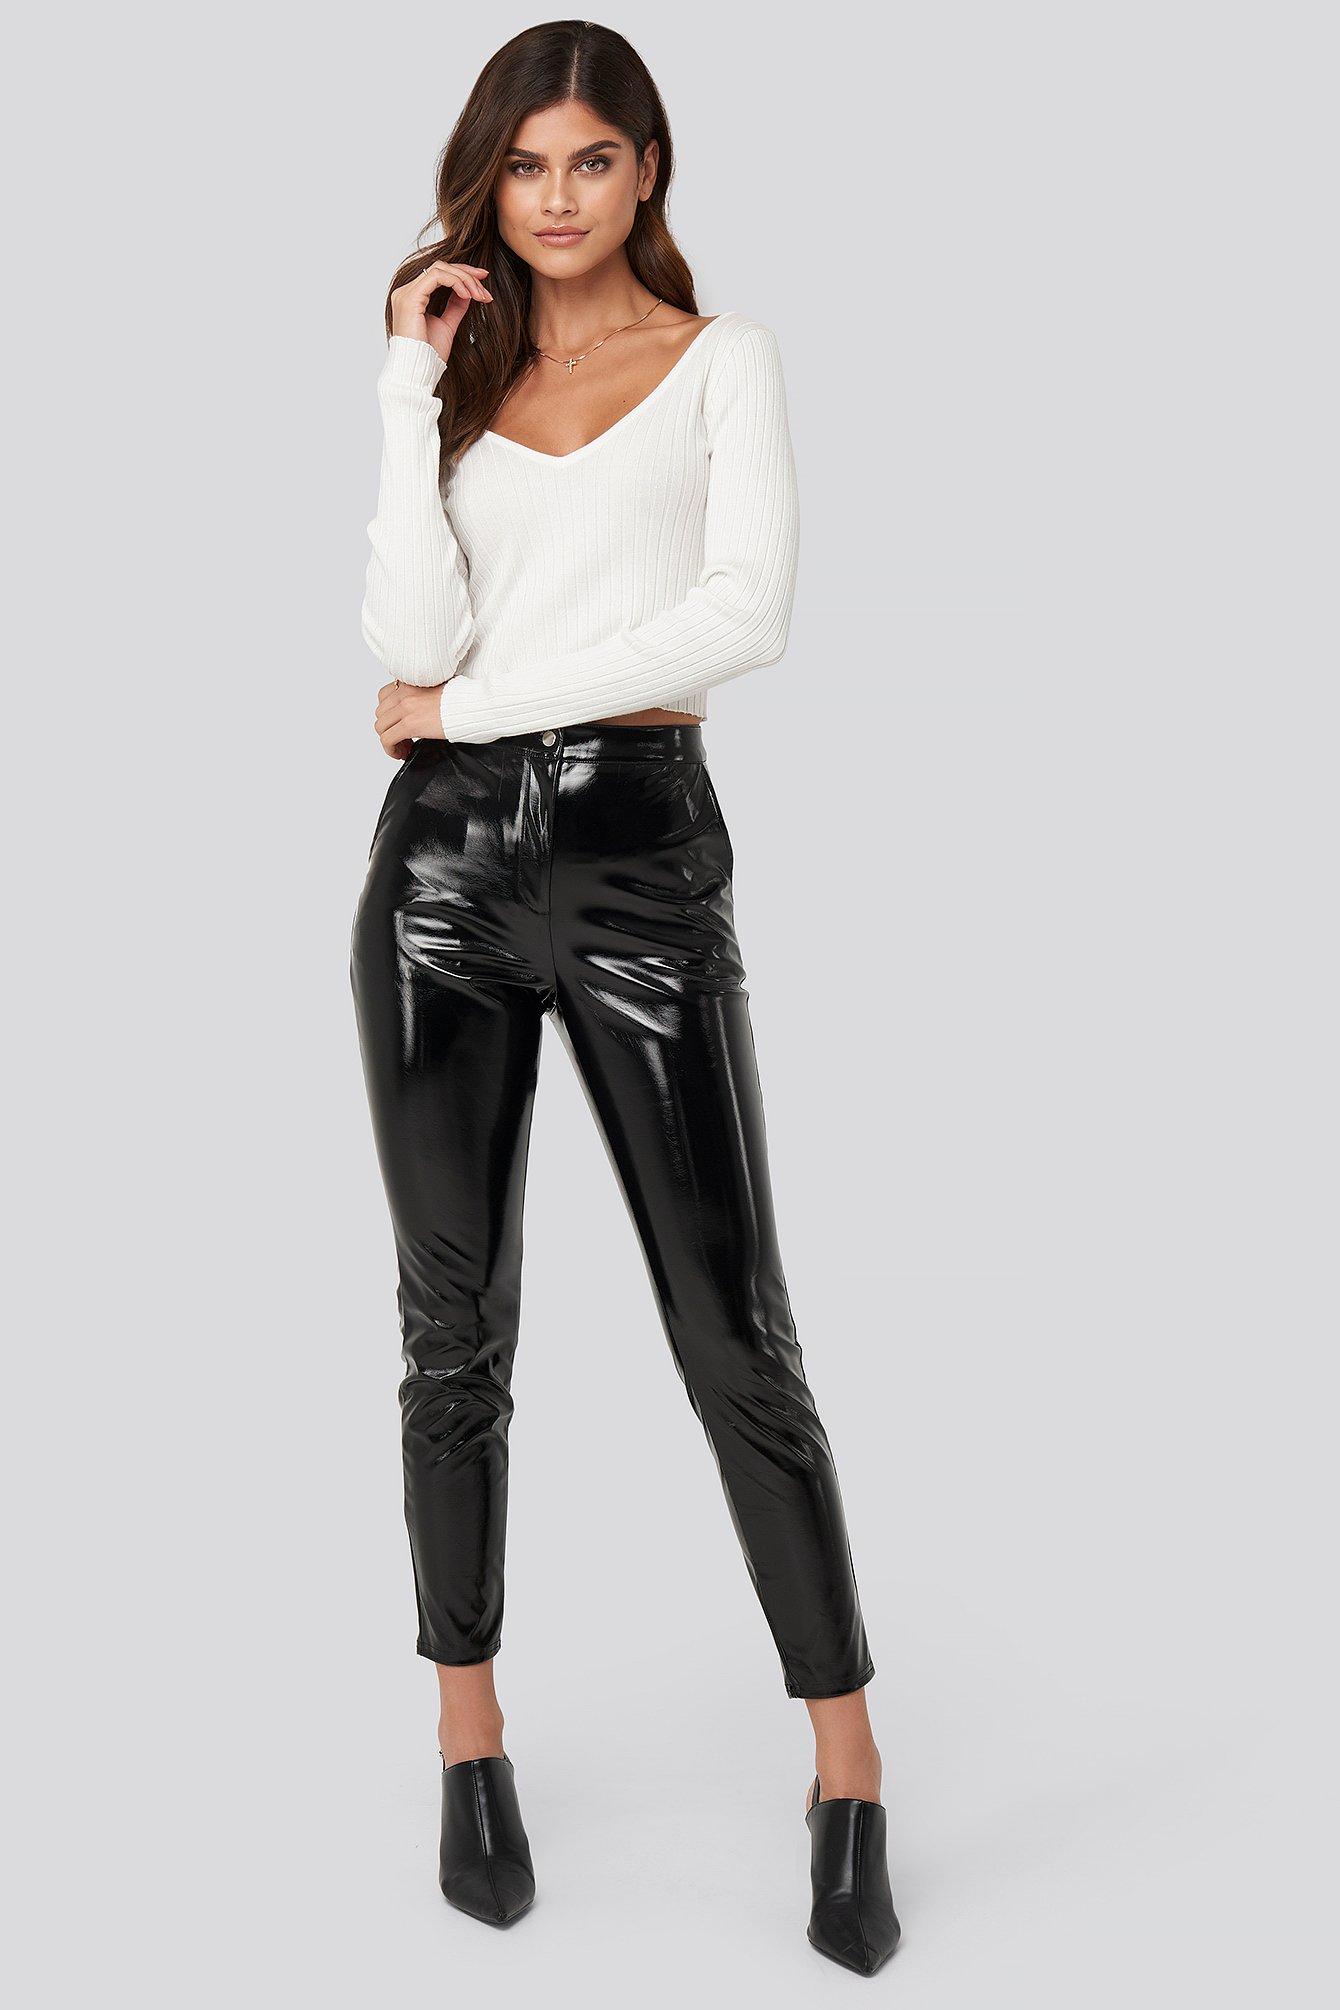 adorable caro x na-kd -  Highwaist Patent Pants - Black